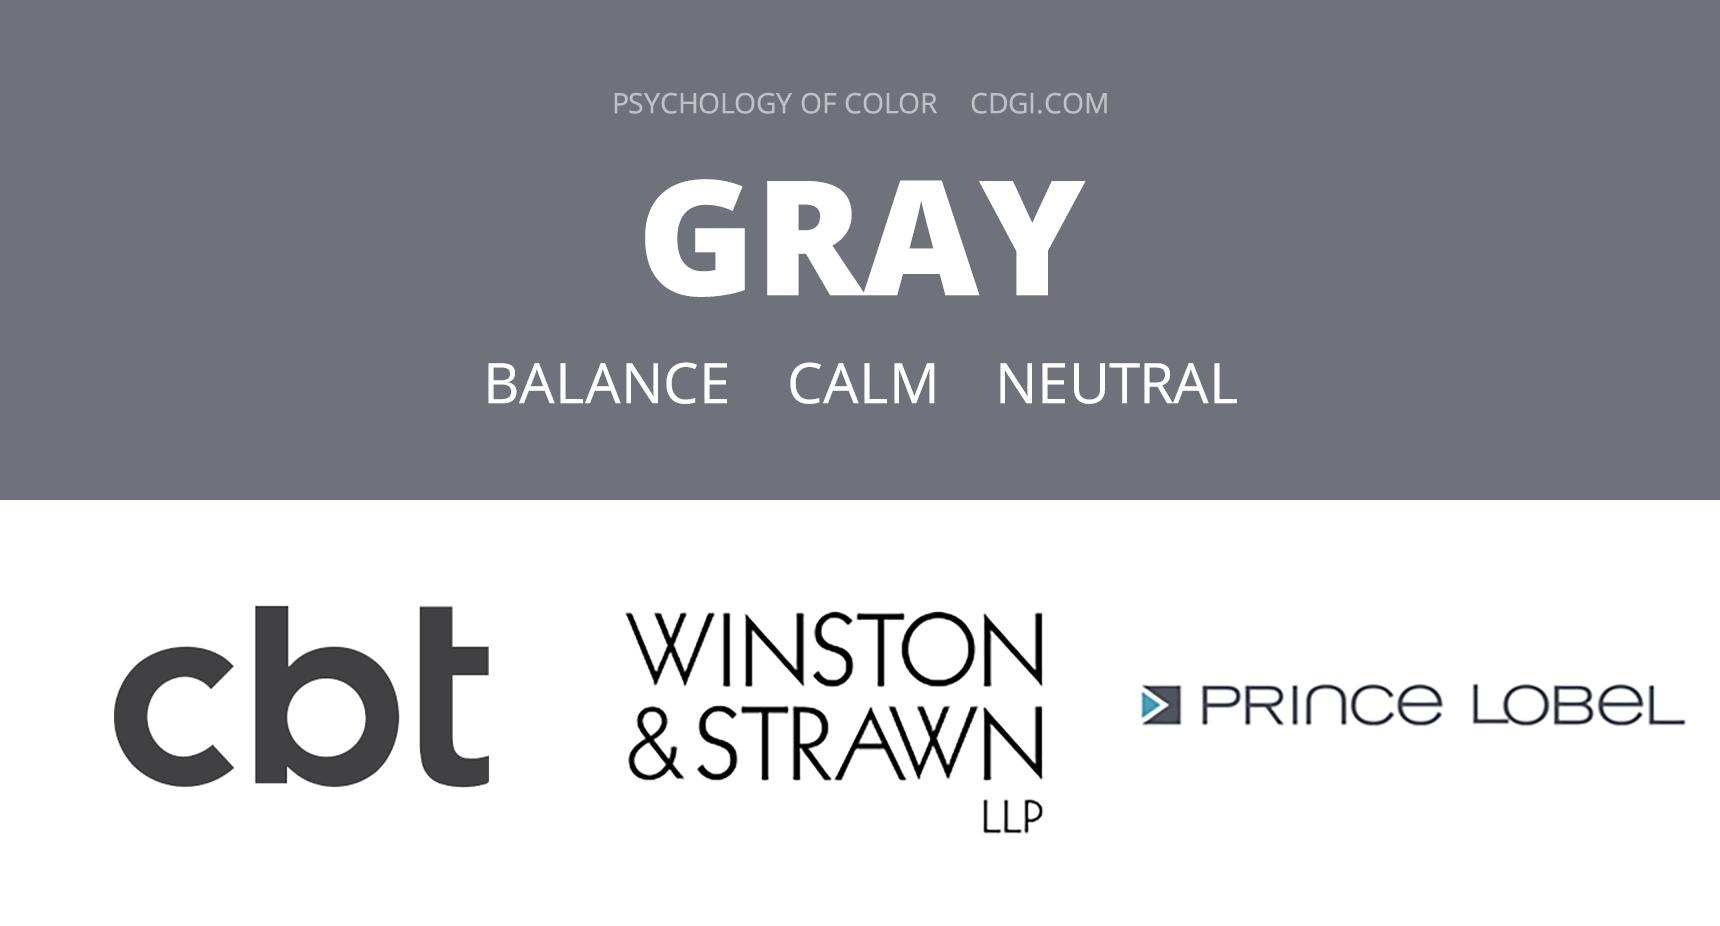 Gray: Balance, Calm, Neutral